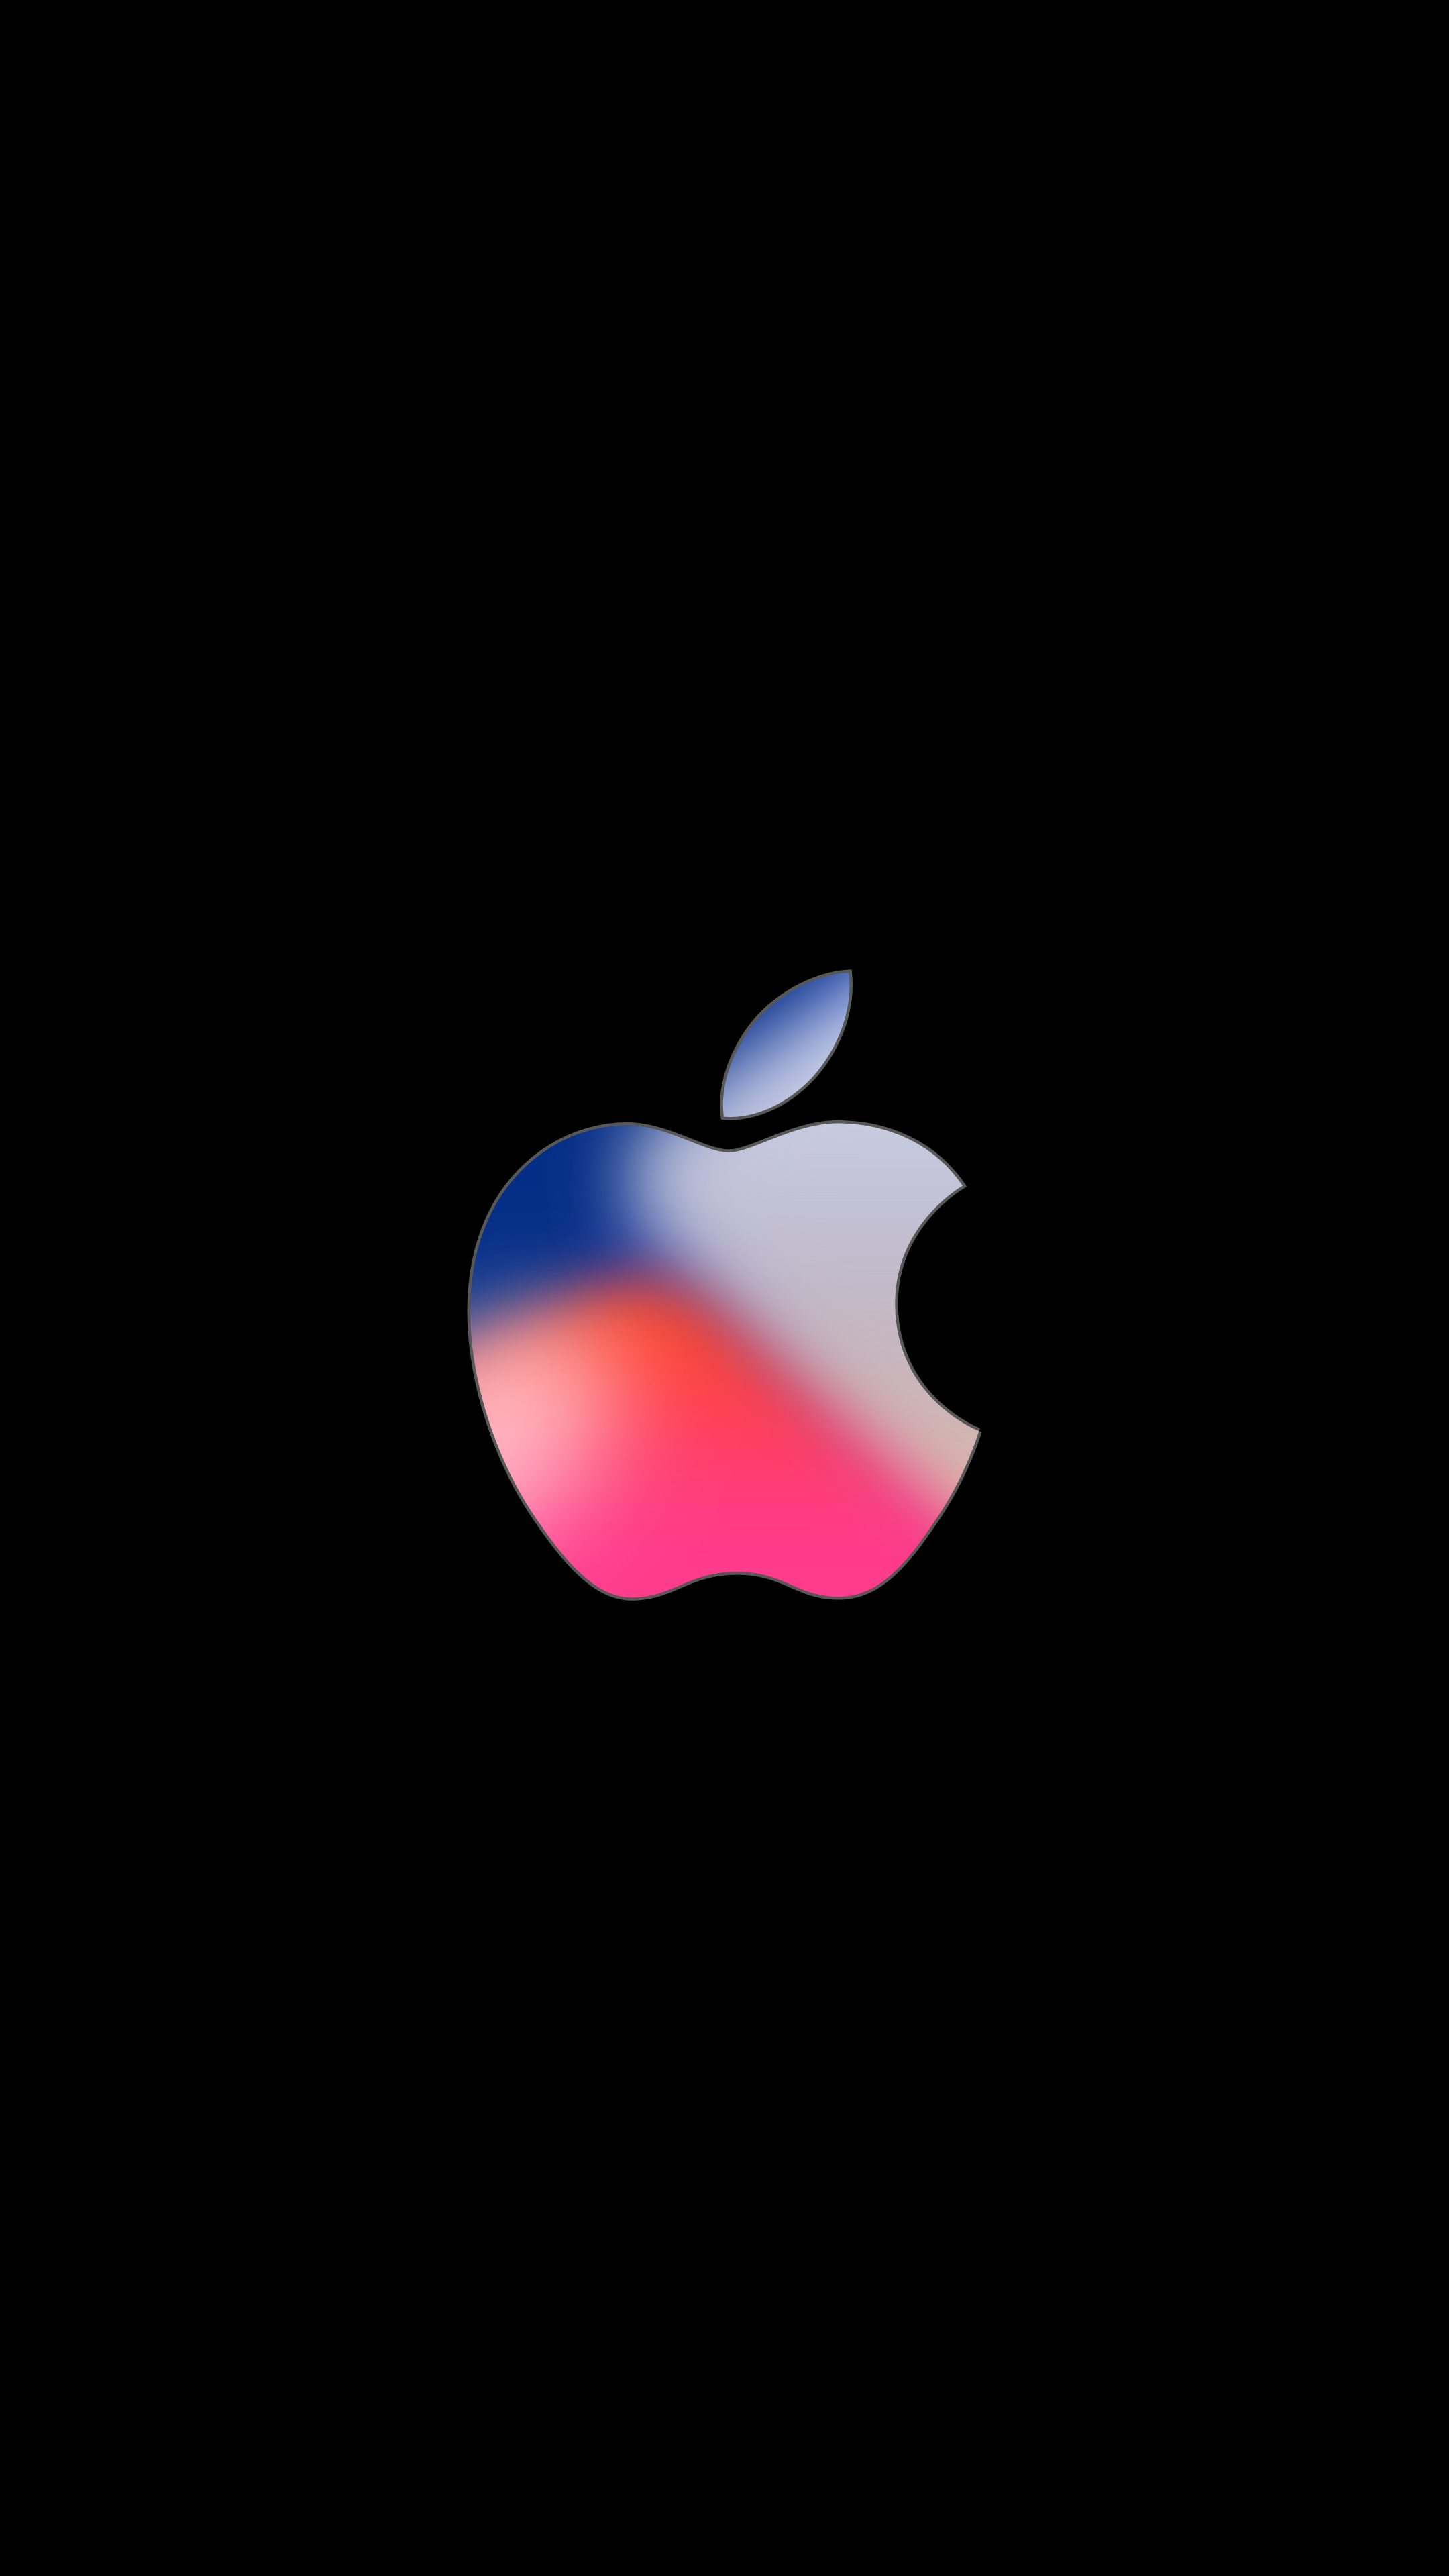 apple iphone x wallpaper download hd